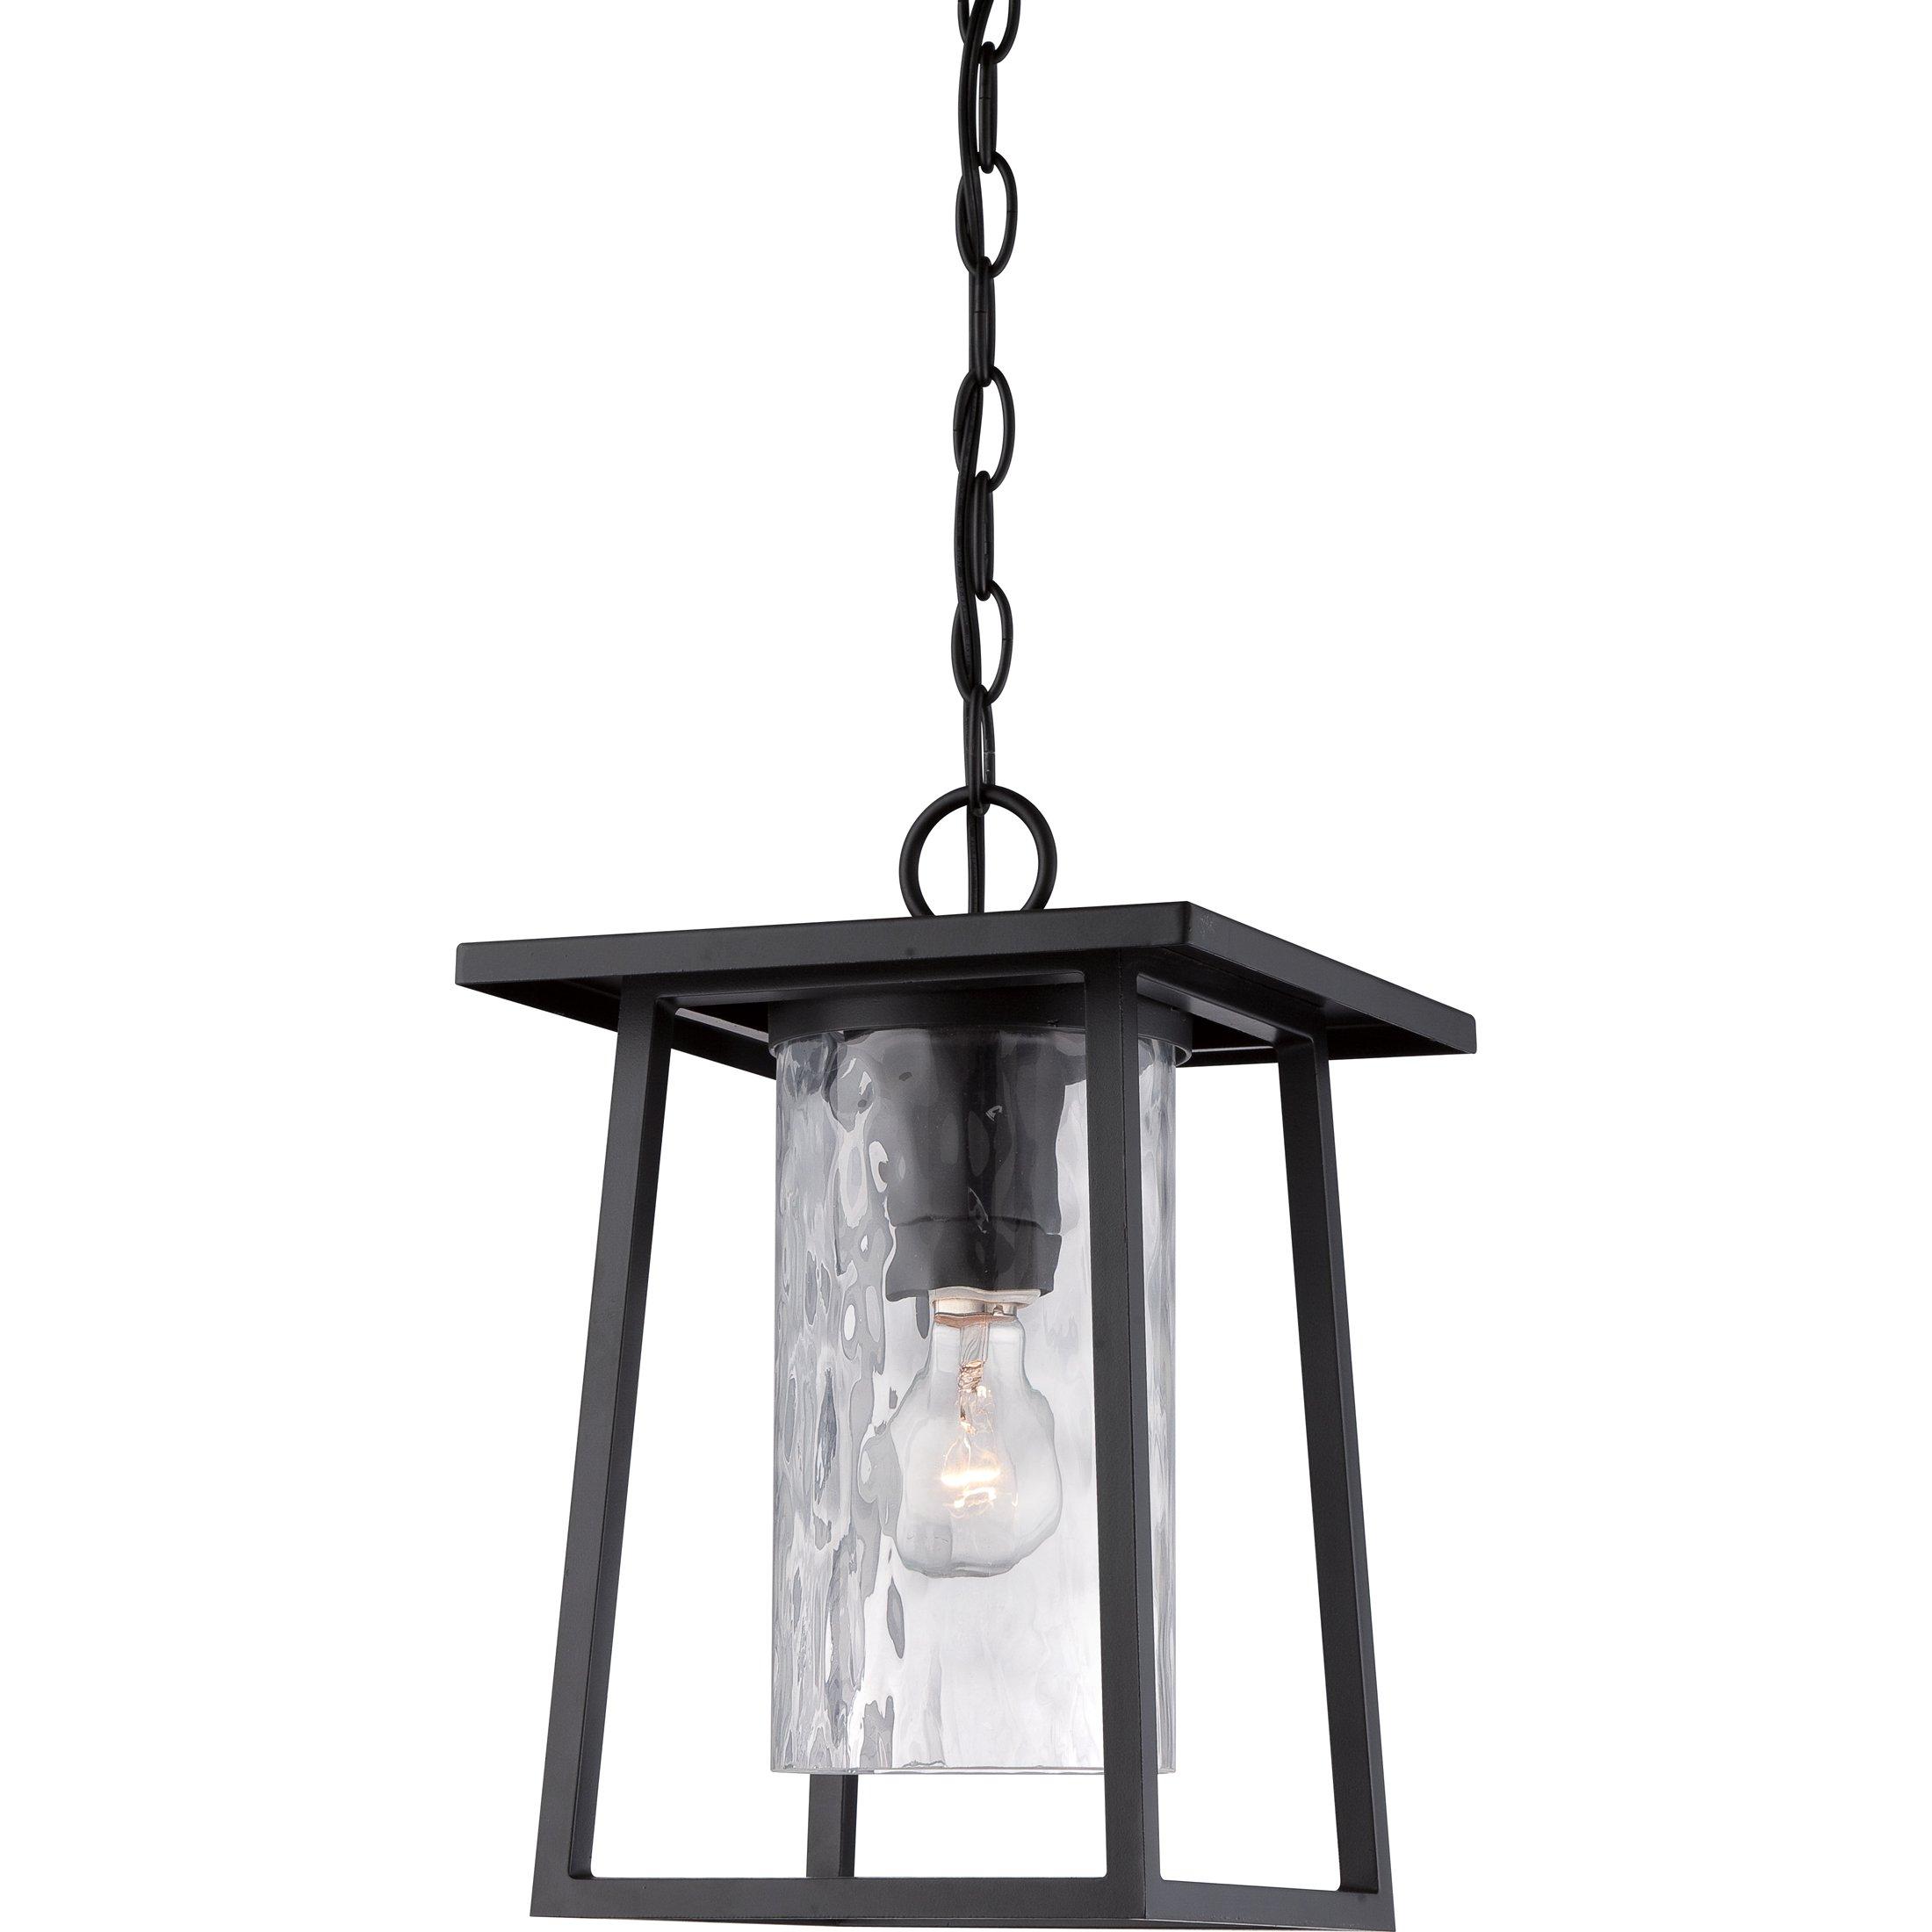 Quoizel LDG1909K 1-Light Lodge Outdoor Lantern in Mystic Black